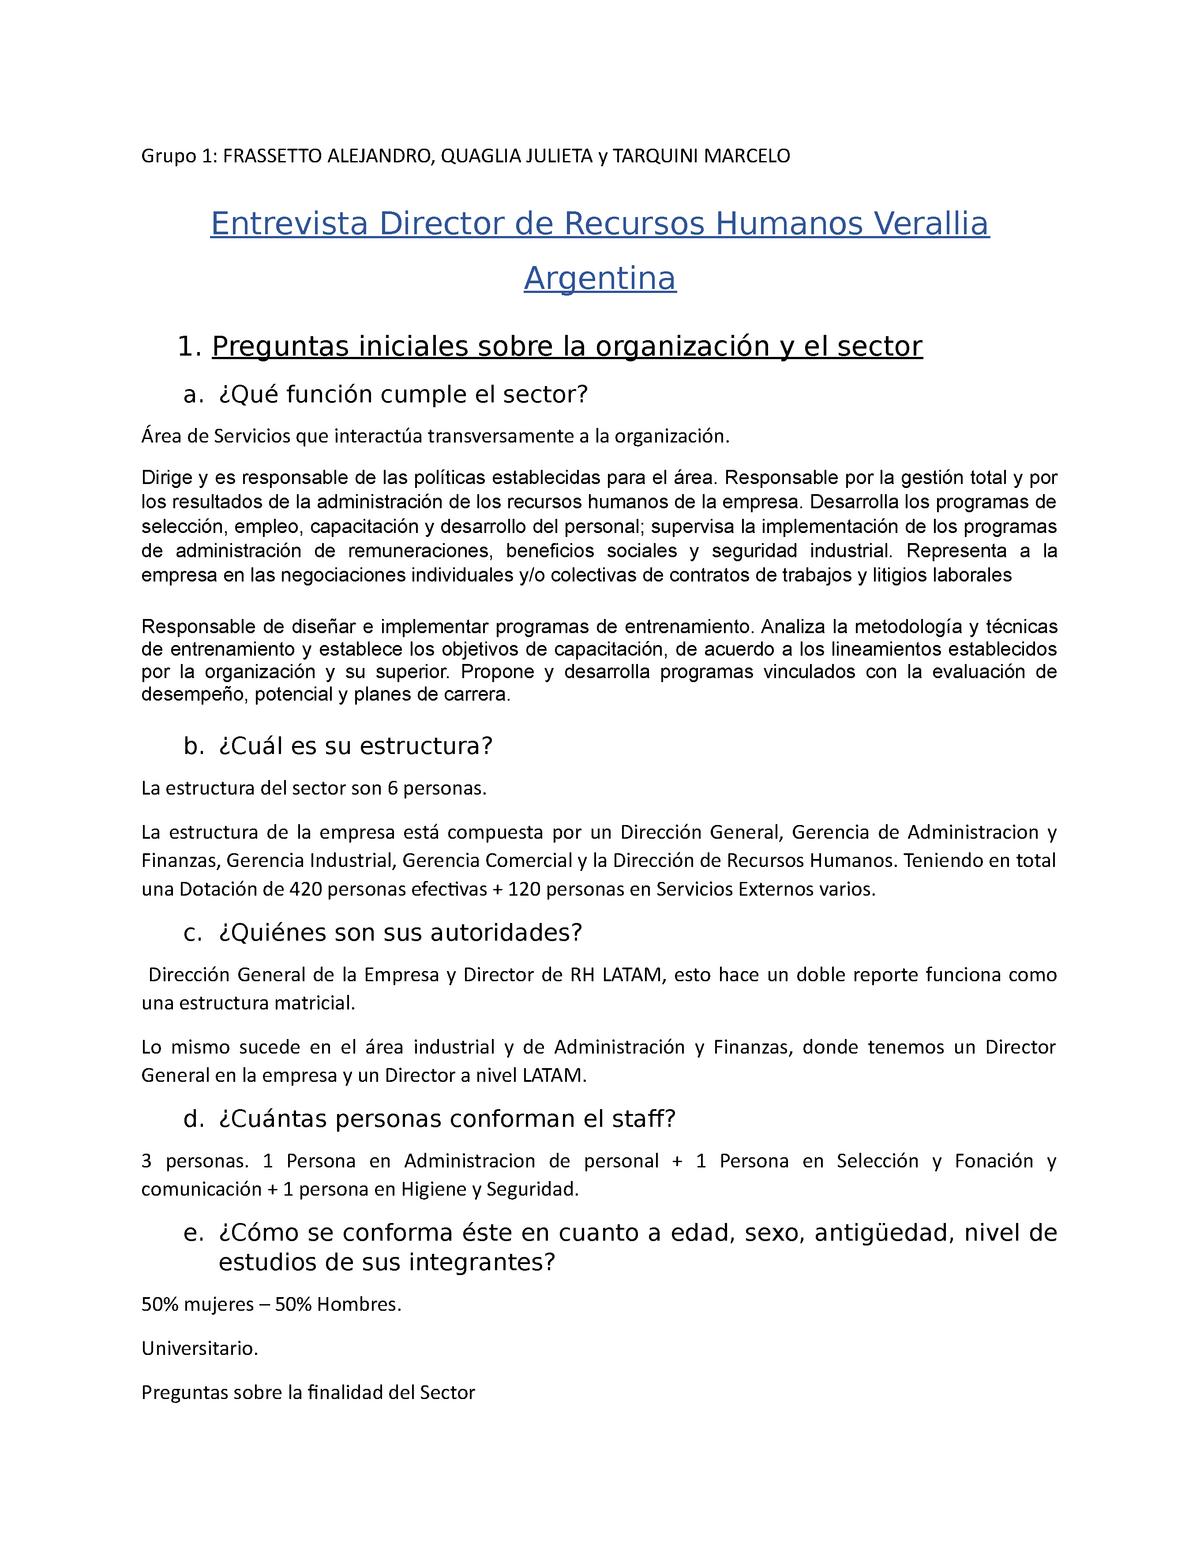 Grupo 1 Entrevista Rh Nota 10 Ba0203 Unfv Studocu